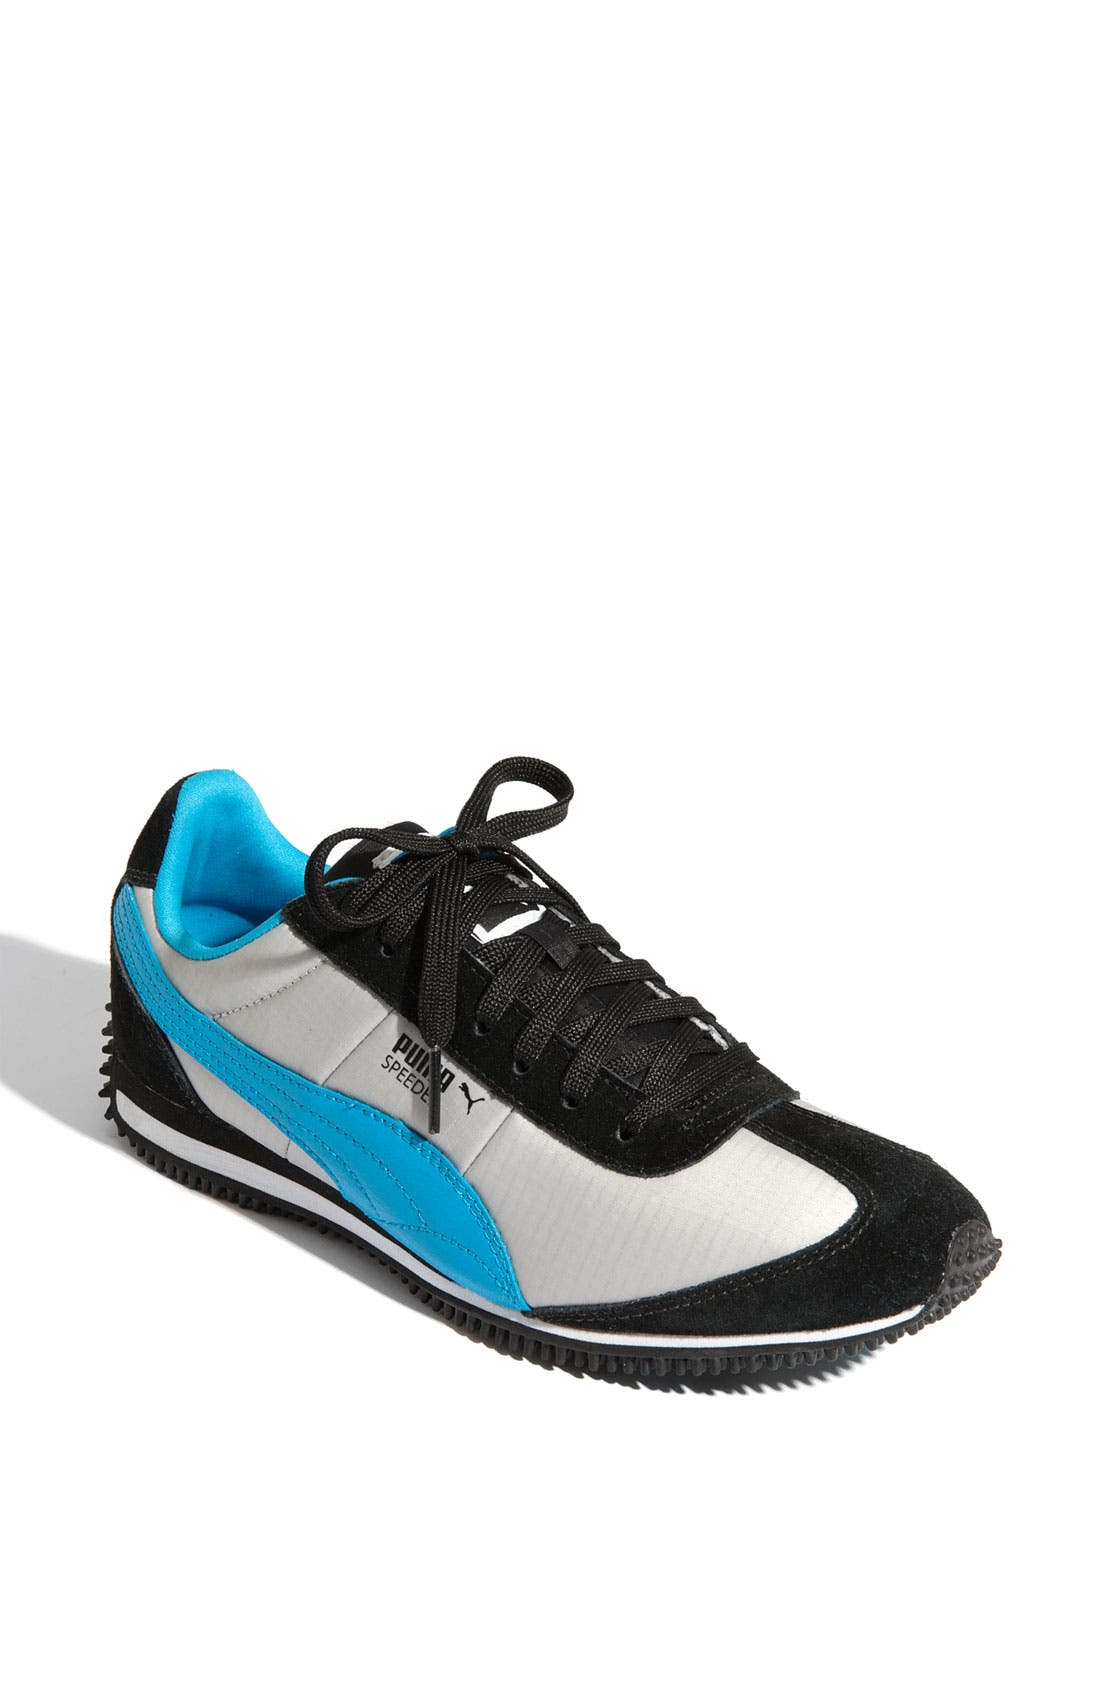 Main Image - PUMA 'Speeder' Sneaker (Women)